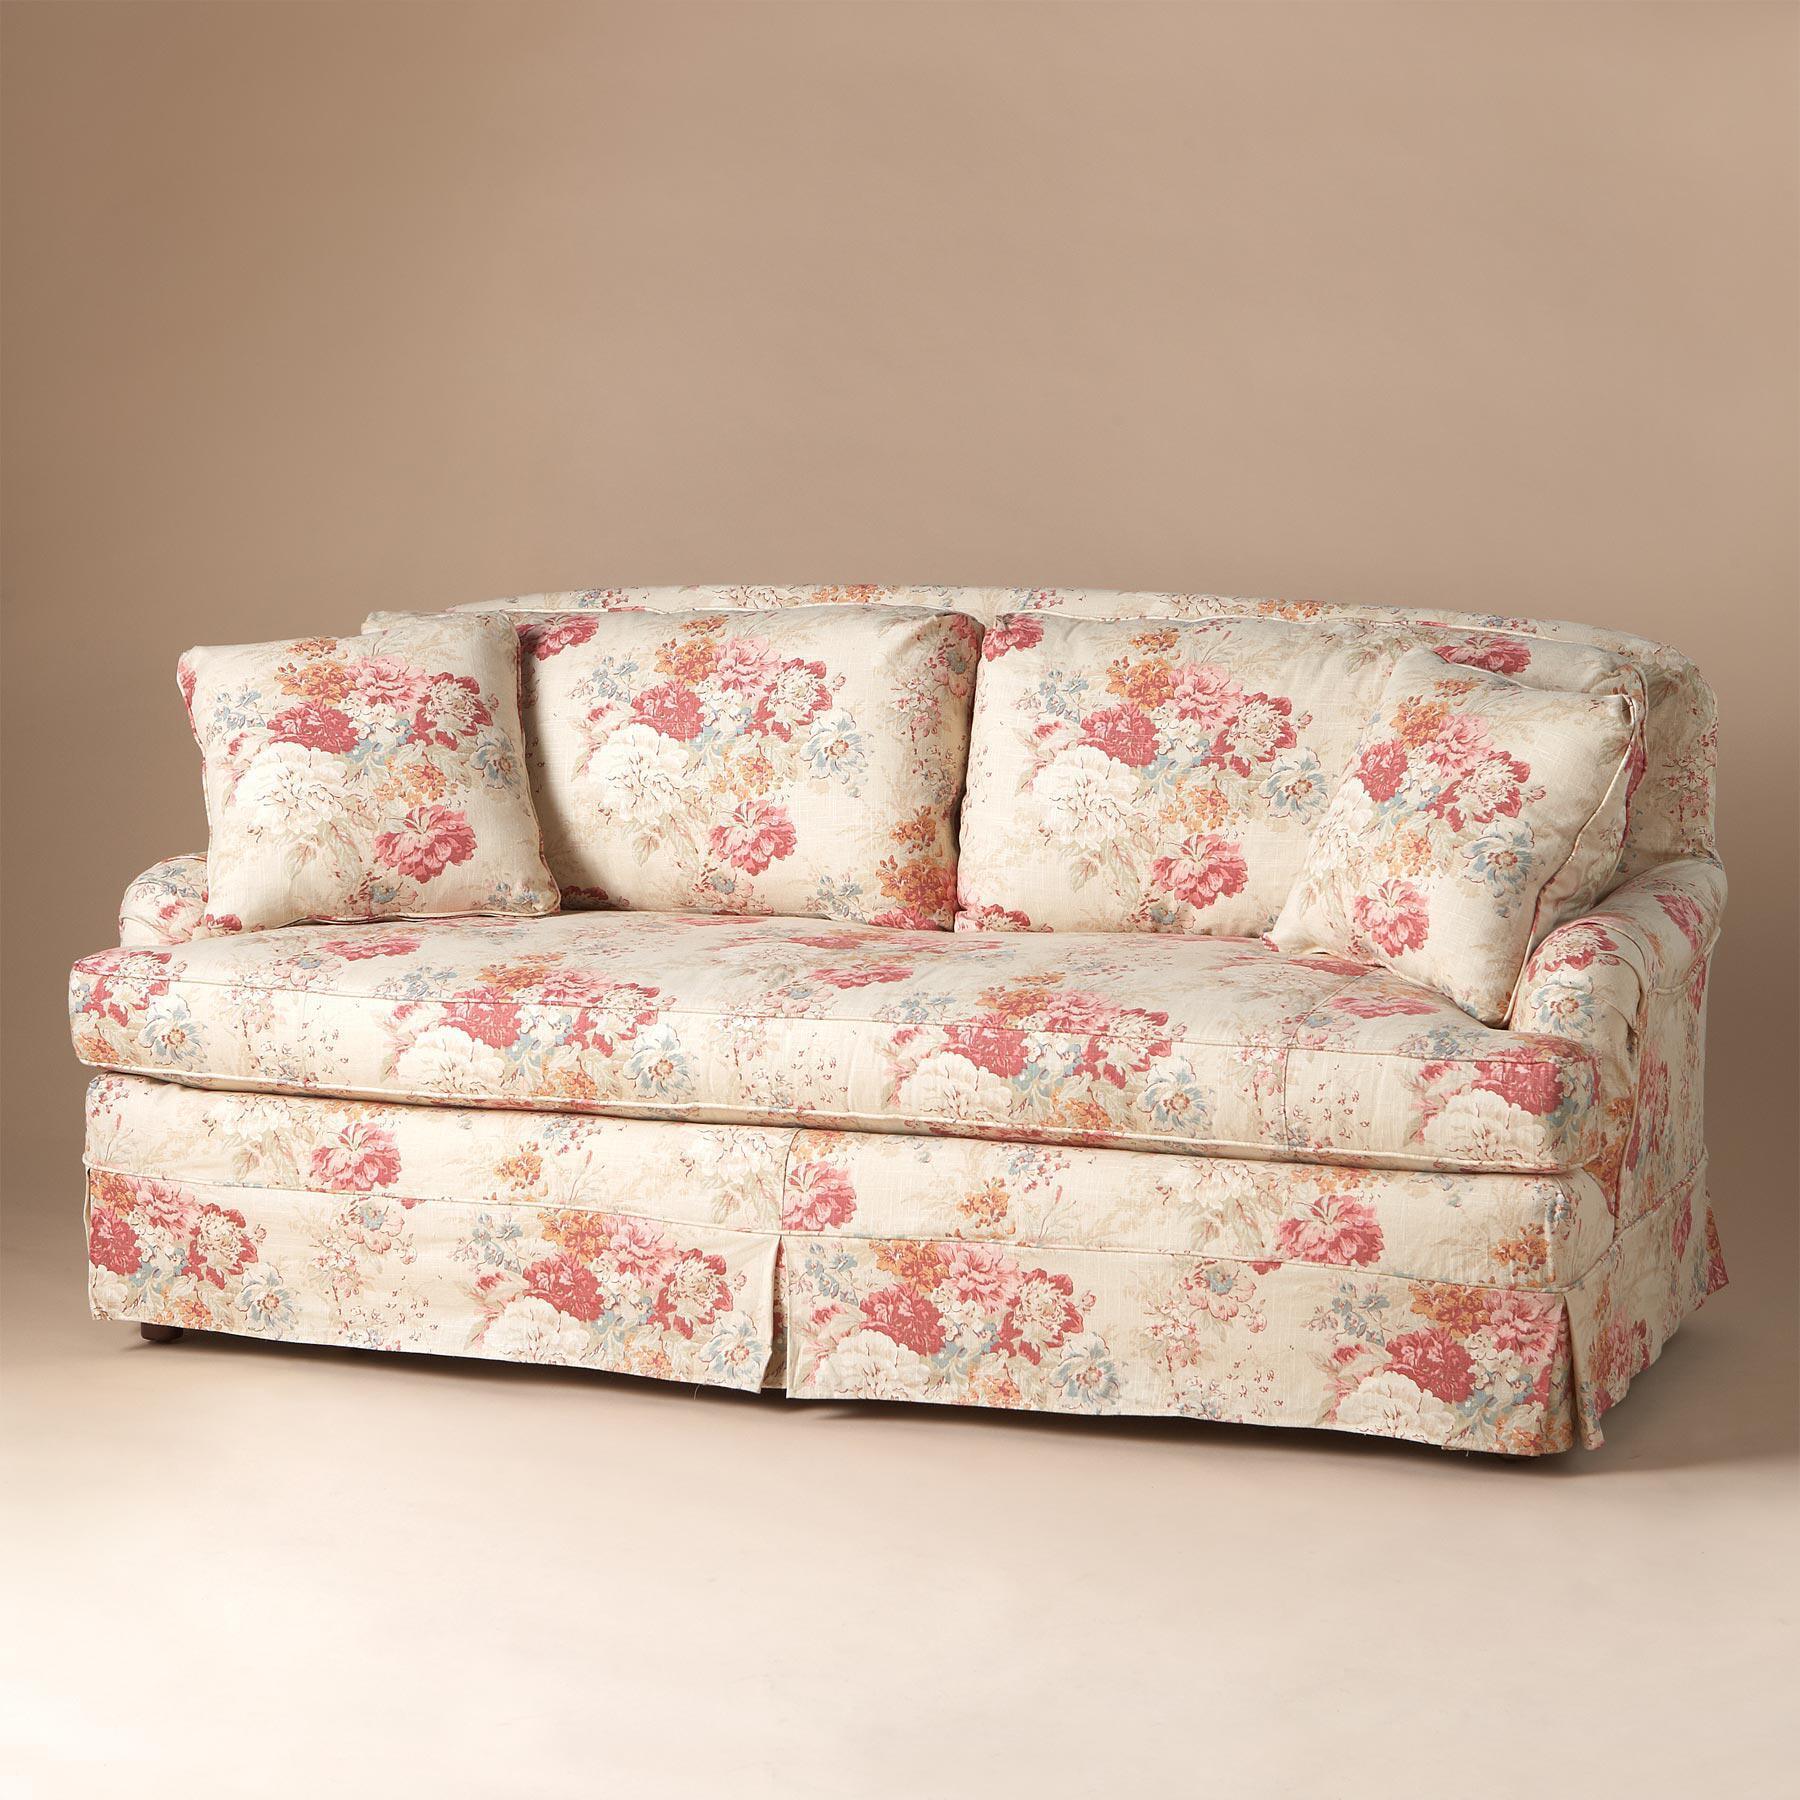 Surprising Vintage Floral Sofa Robert Redfords Sundance Catalog Pabps2019 Chair Design Images Pabps2019Com